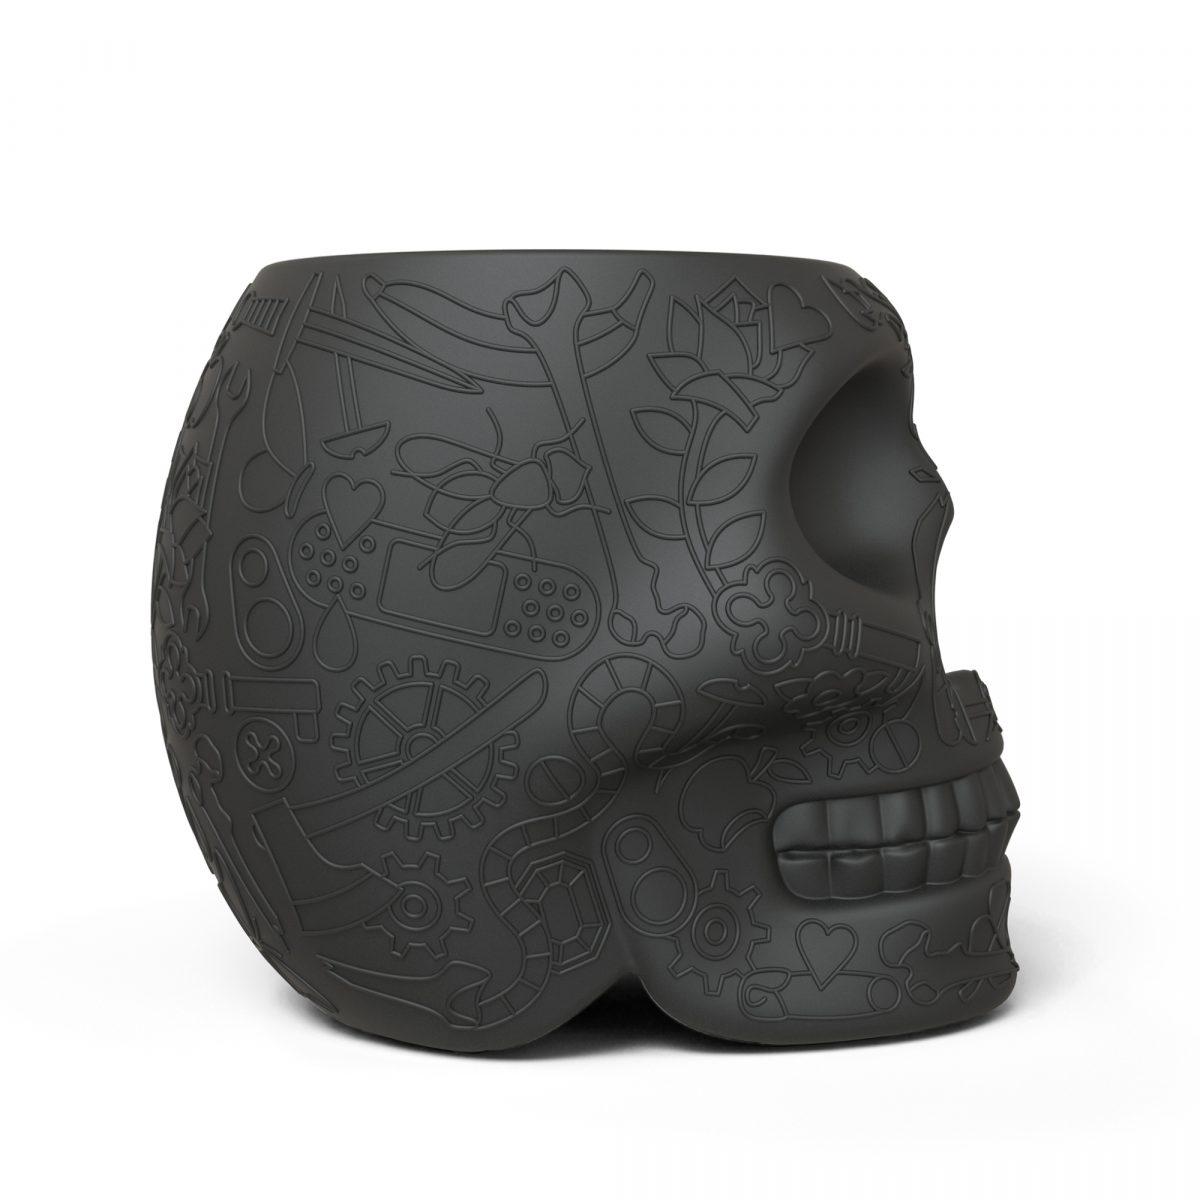 Qeeboo Mexico Krukje Bijzettafel Buiten Binnen Zwart Design